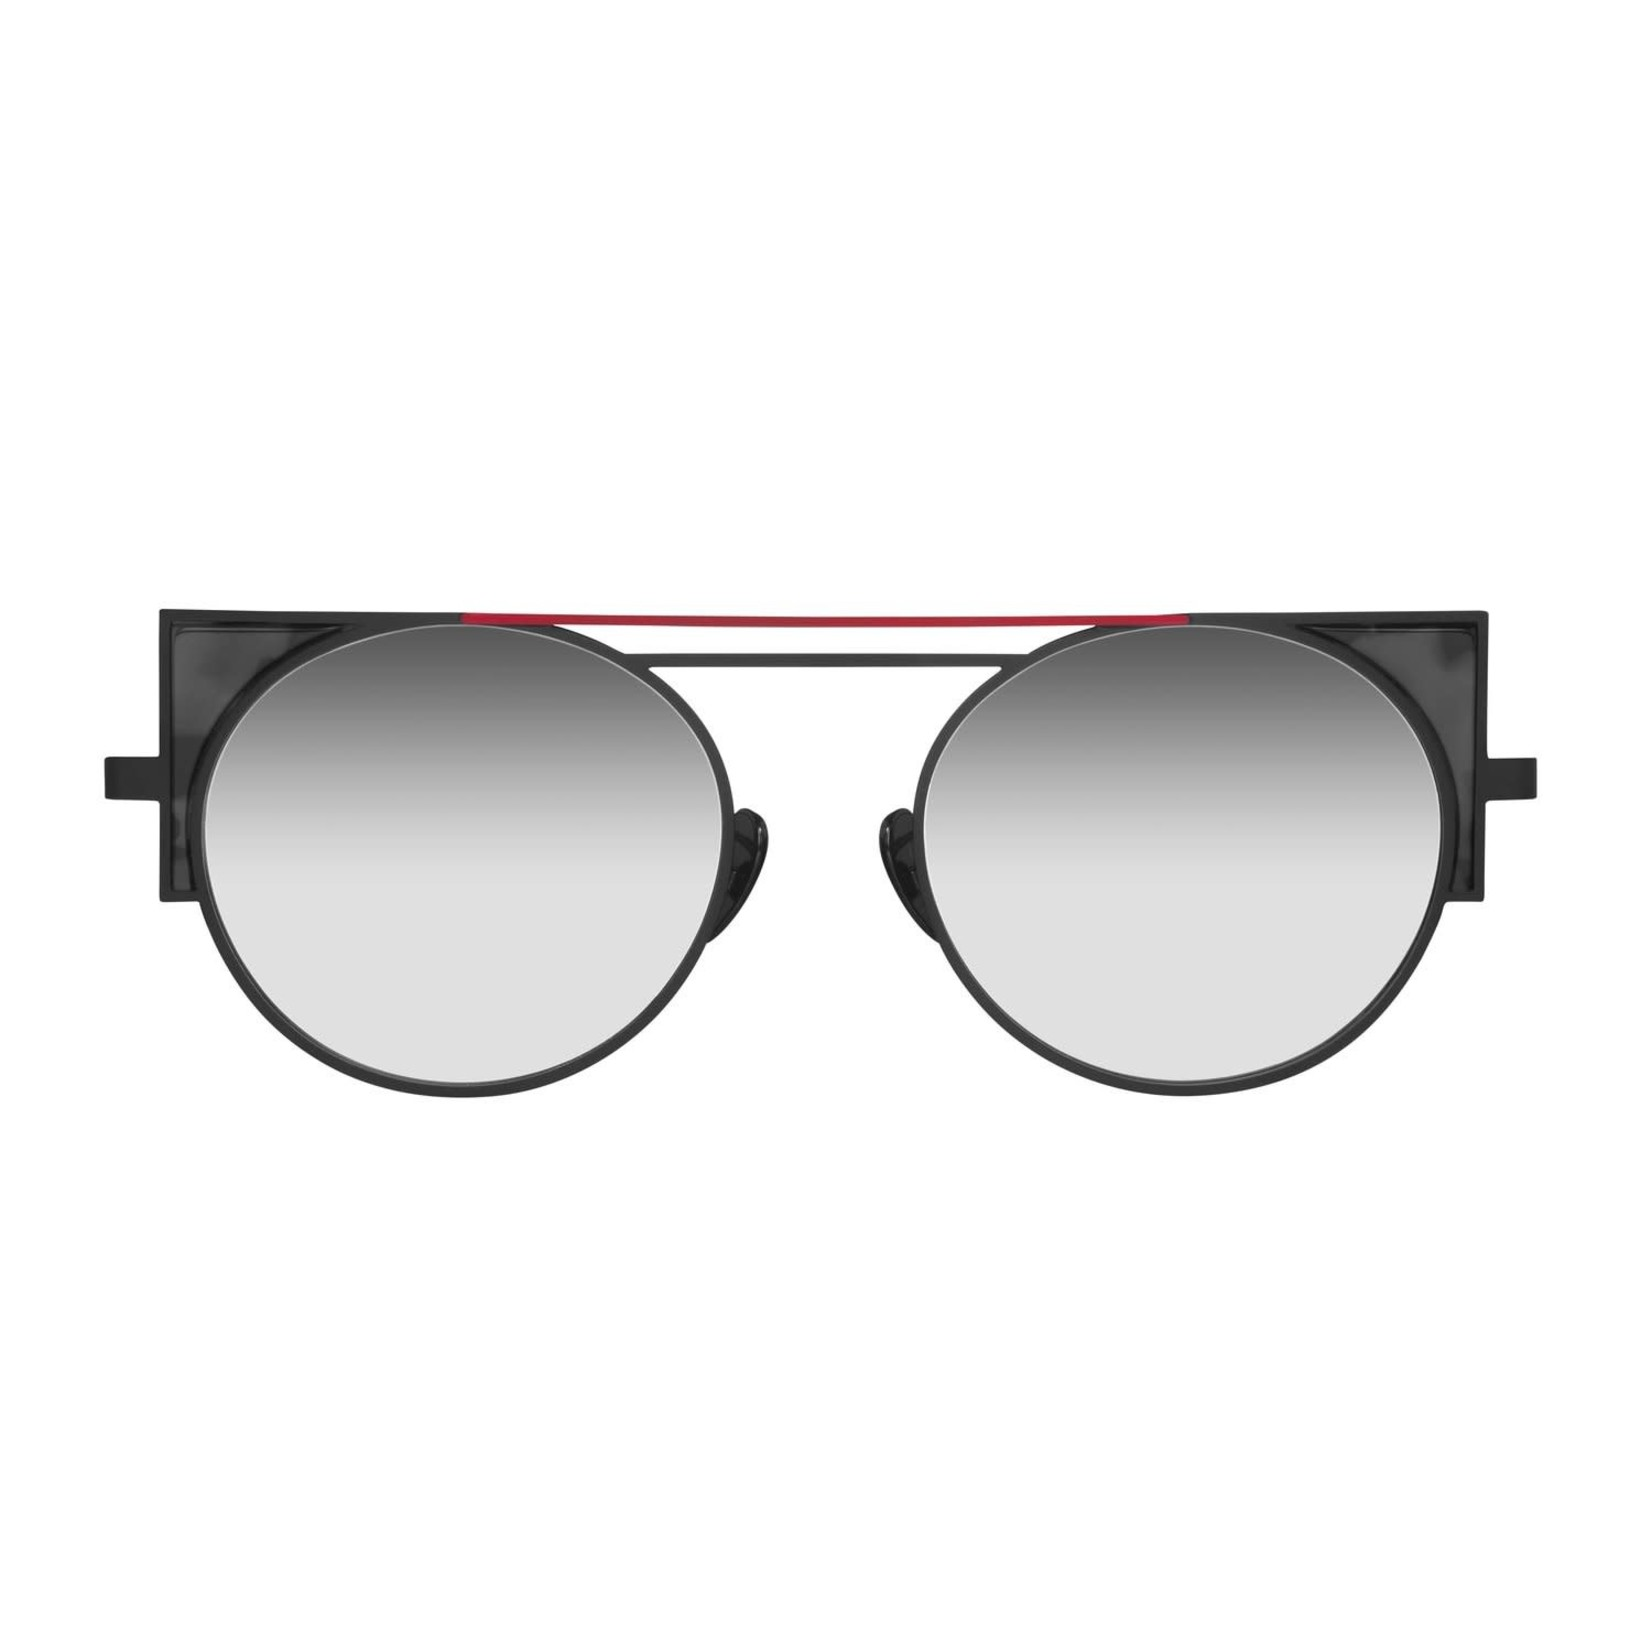 La Petite Lunette Eyewear LPLR Quatibas Sun